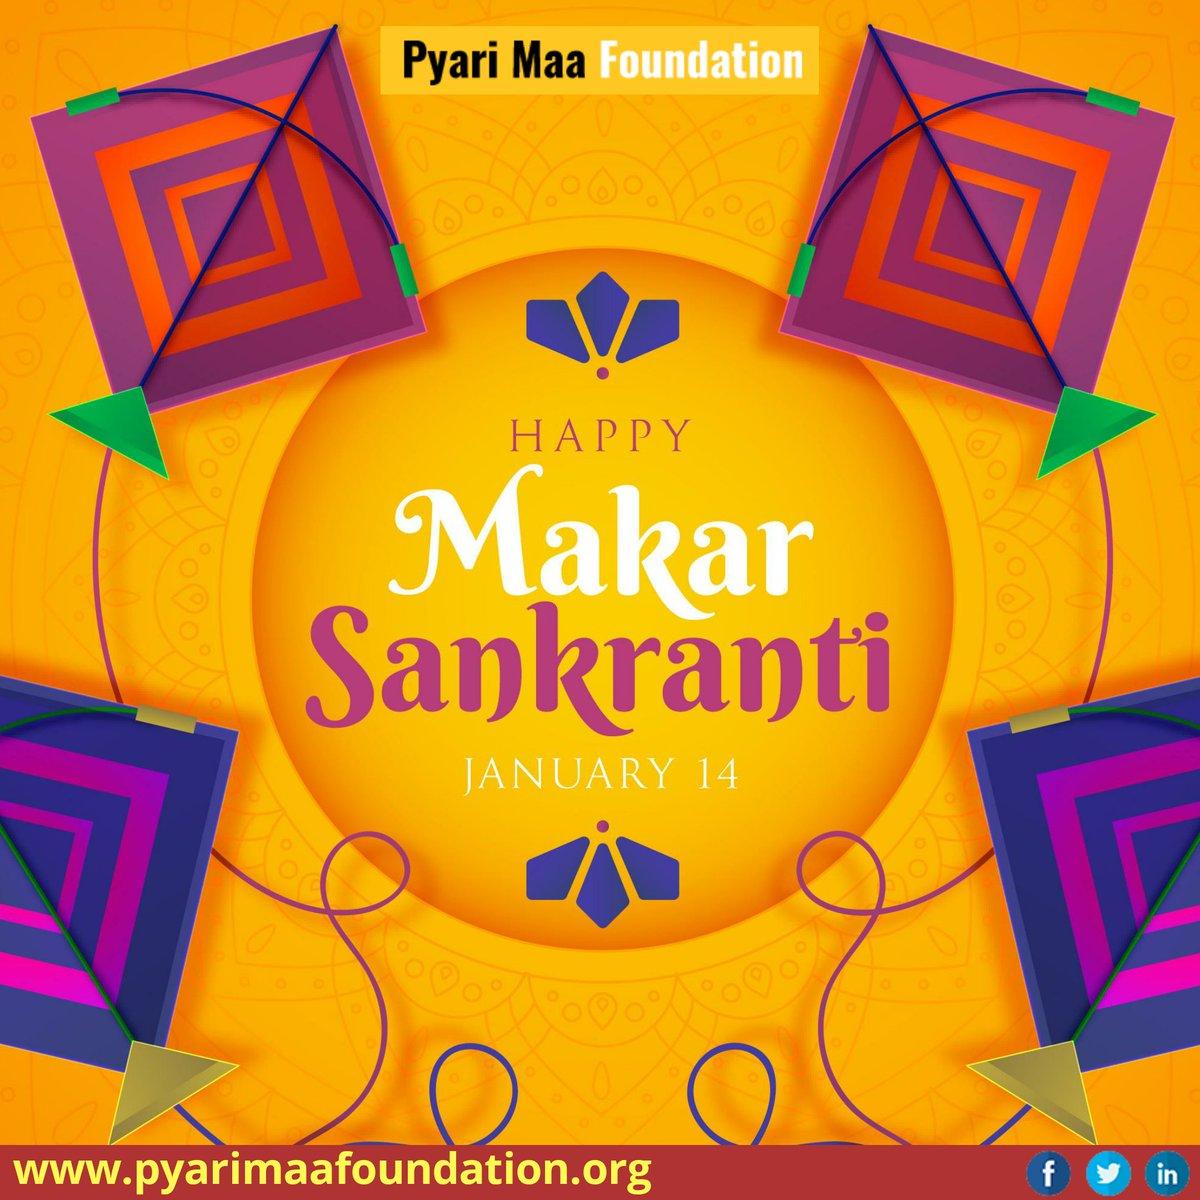 May the Makar Sankranti end all moments of sadness and bring joy and happiness. #PyariMaaFoundation #HappyMakarSankranti #HappyMakarSankranti2021 #MakarSankranti2021 #MakarSakranti #MakarSankranti